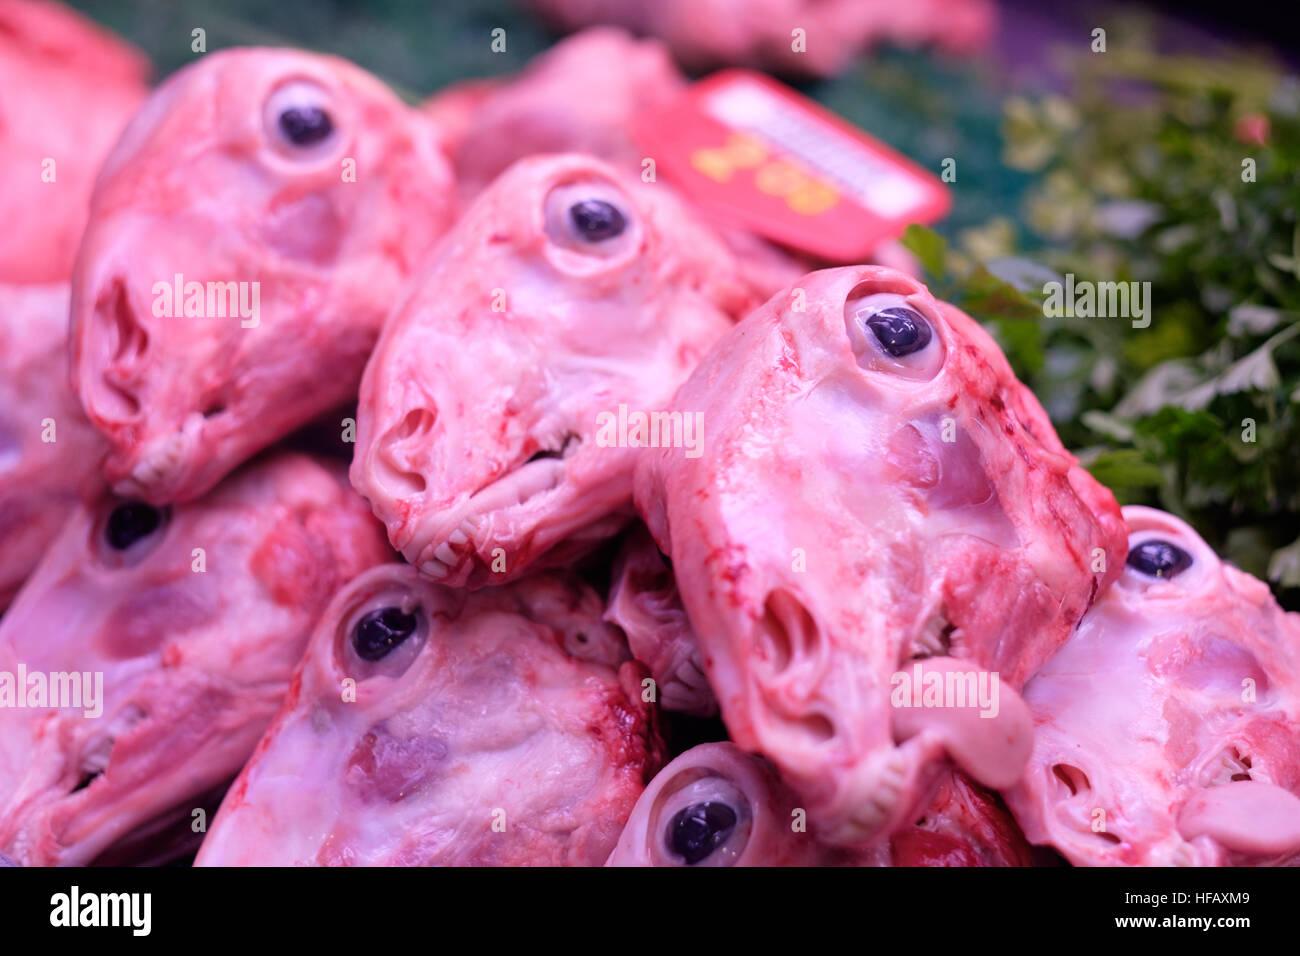 Cabeza de oveja skinless ojos ojos carnicero lanza Imagen De Stock